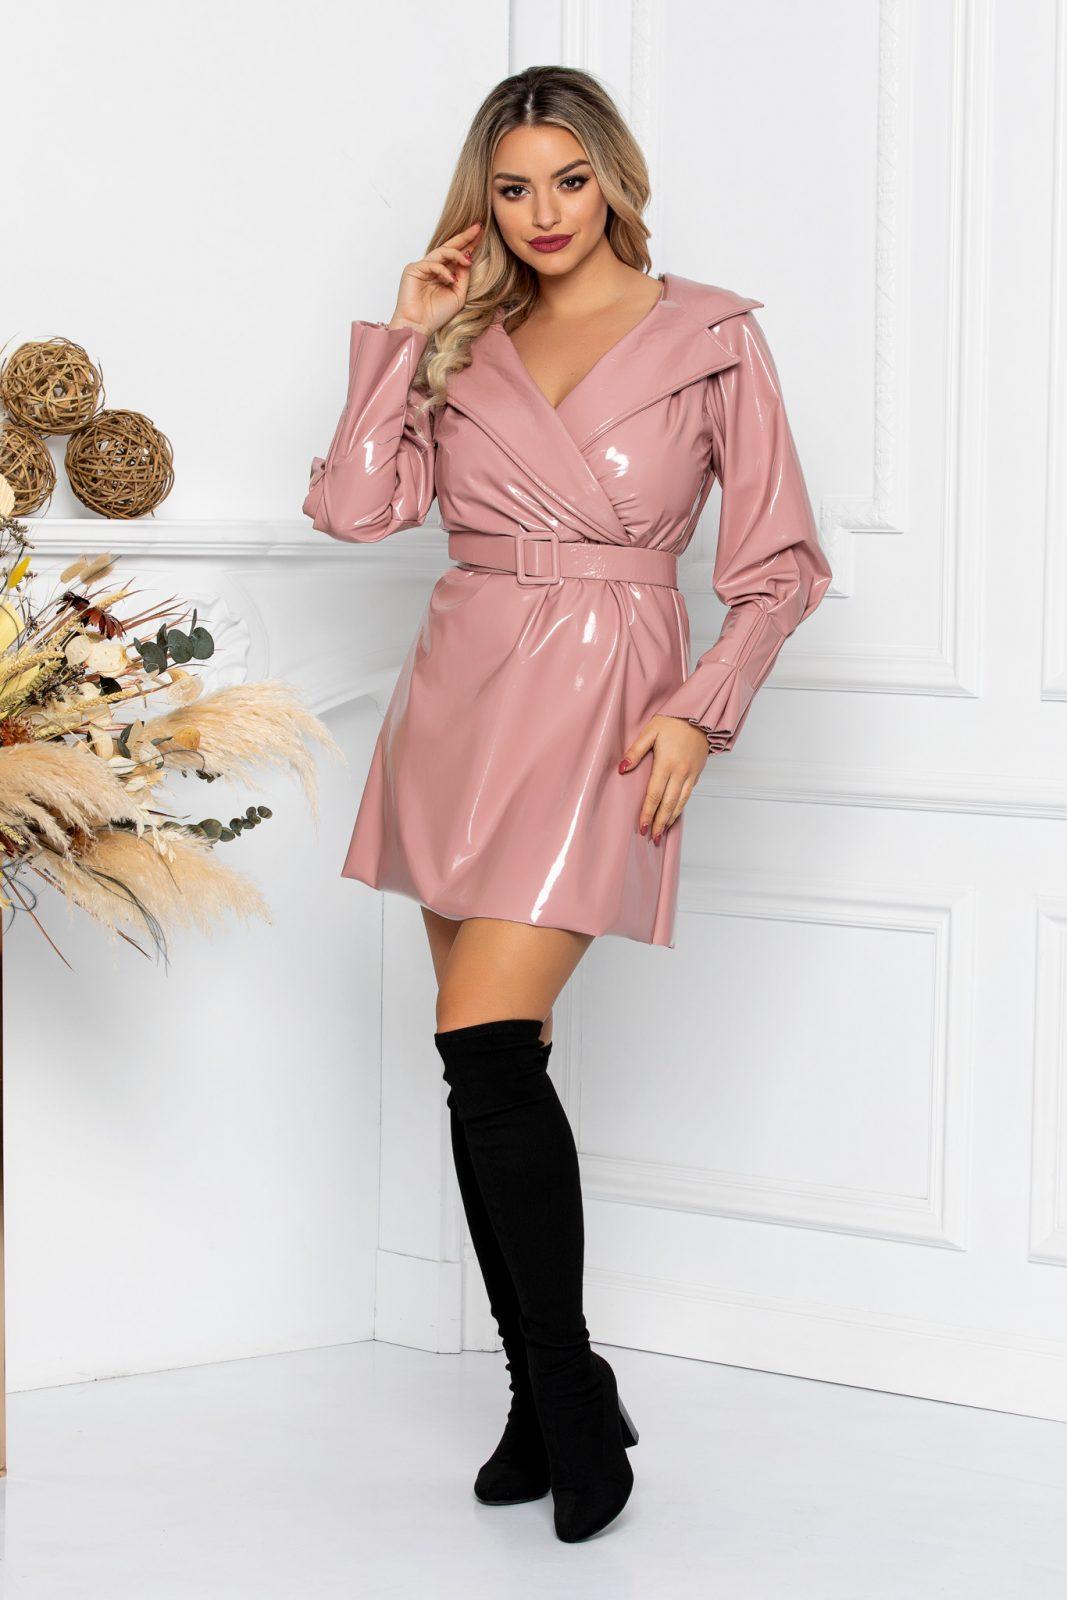 Chaboo Pink Dress